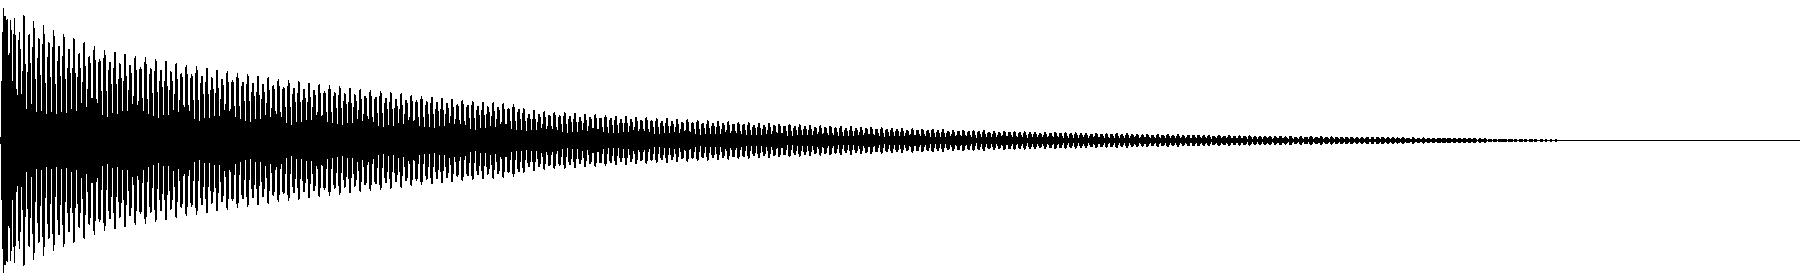 808 130 bpm